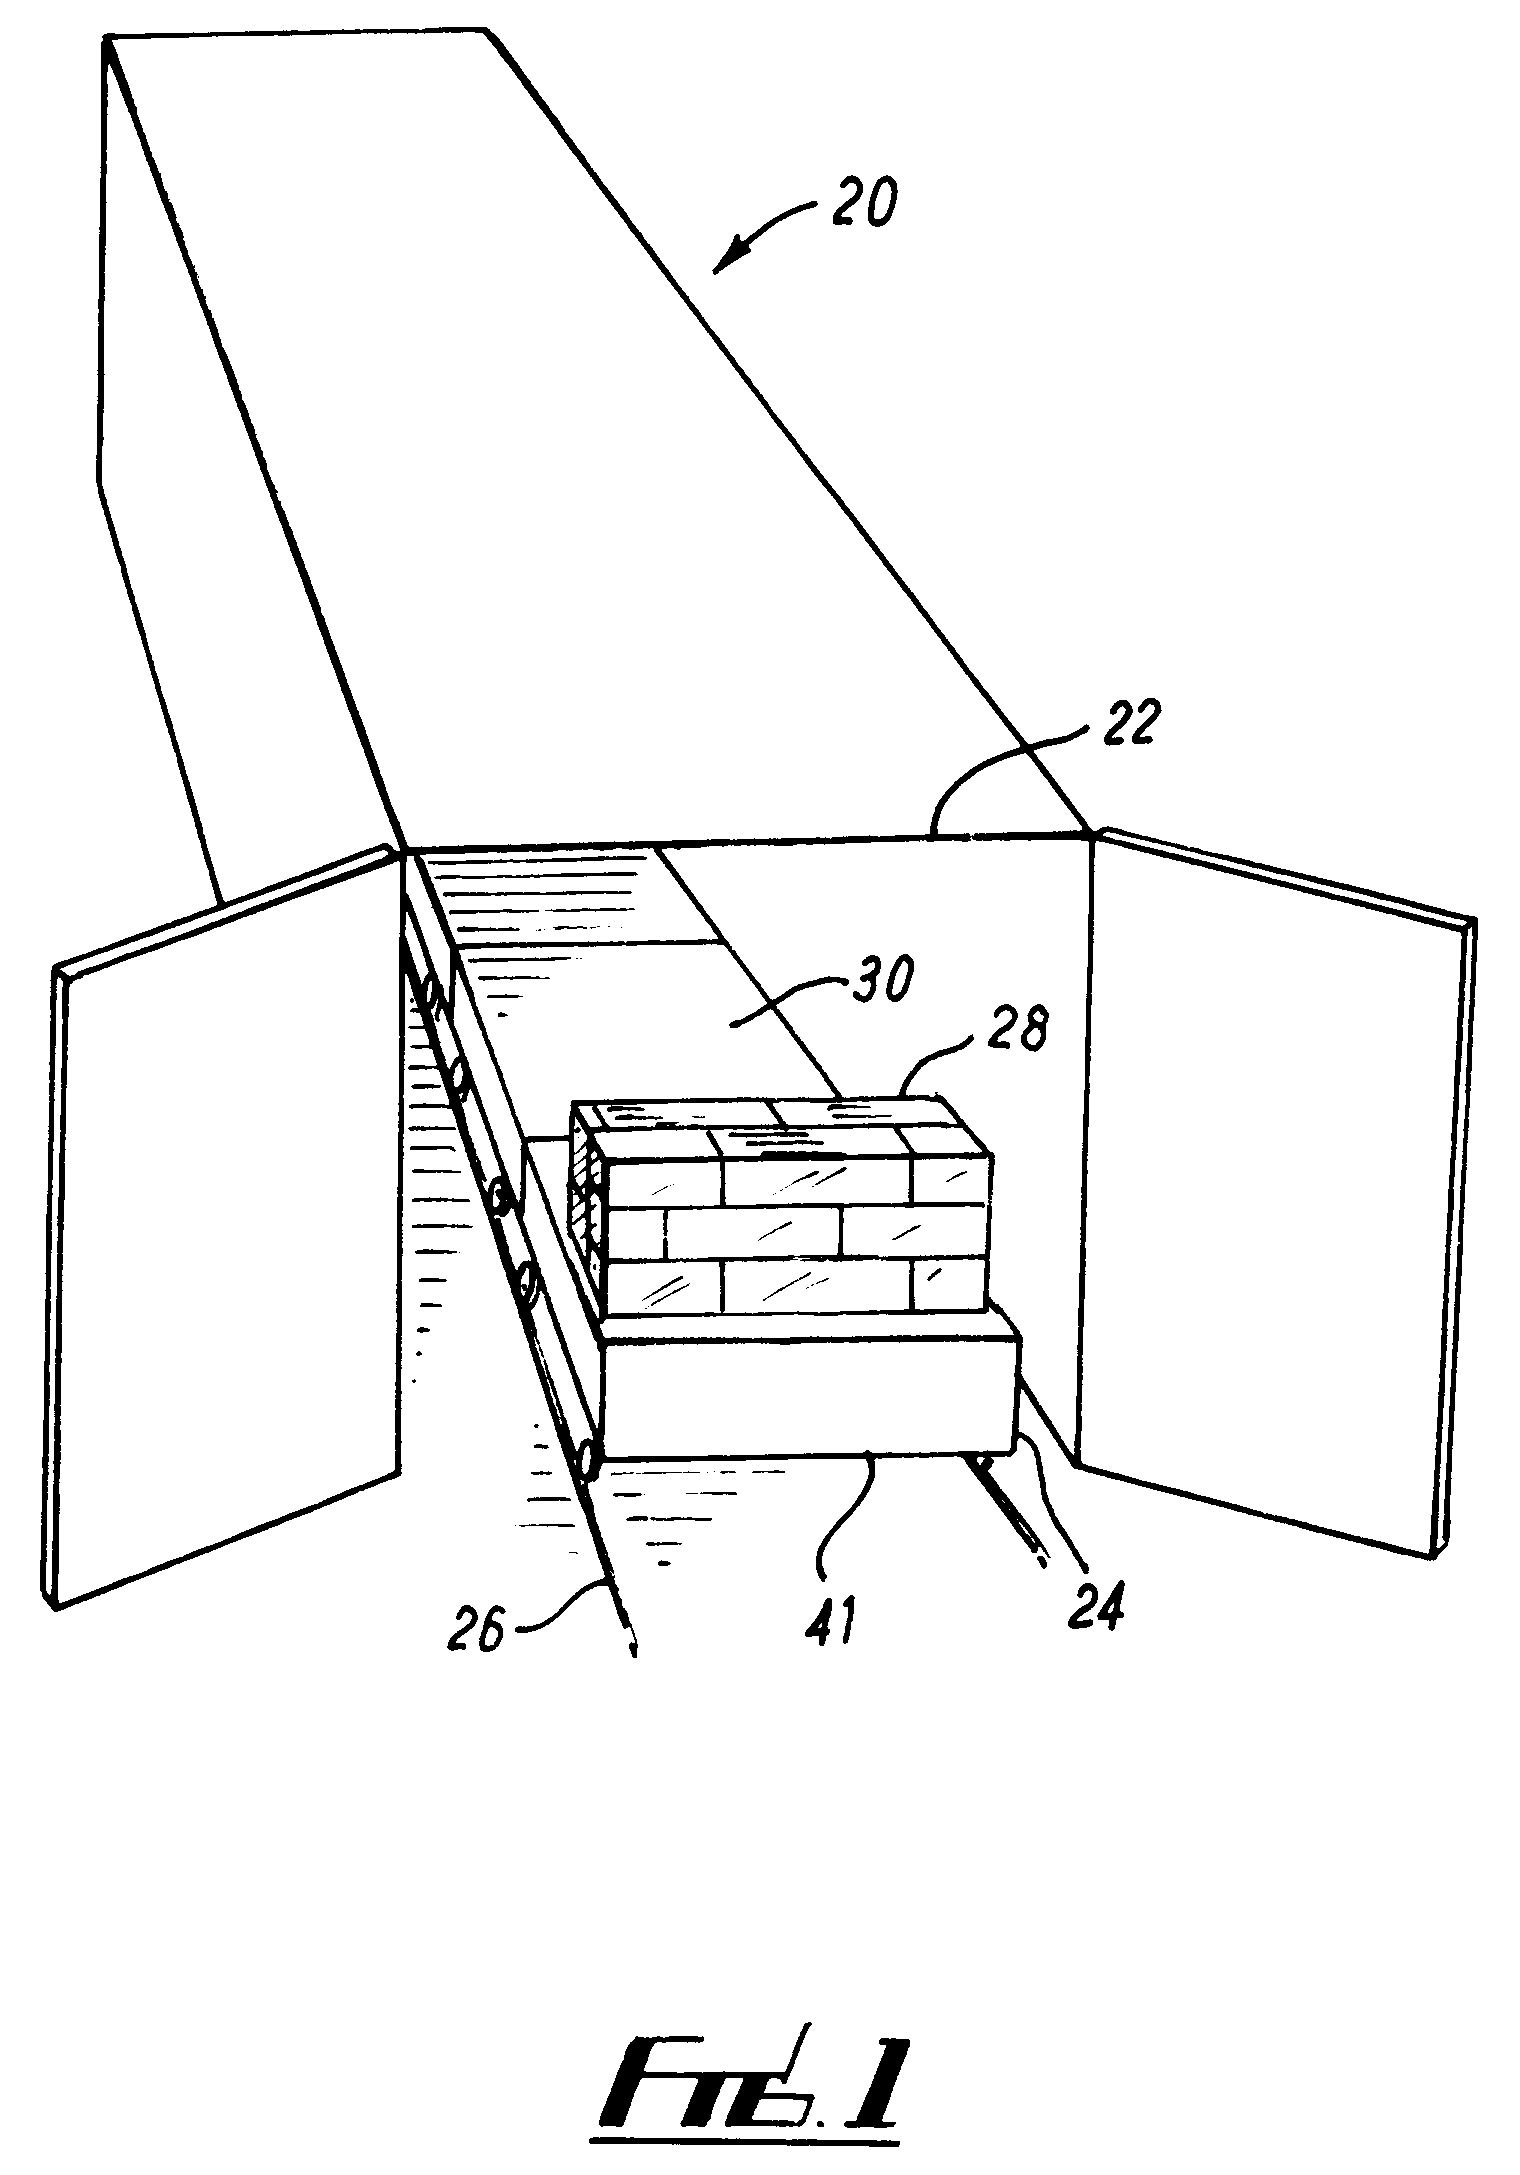 patent ep0651219a1 kiln control patents Kiln Wiring Diagrams Power patent drawing